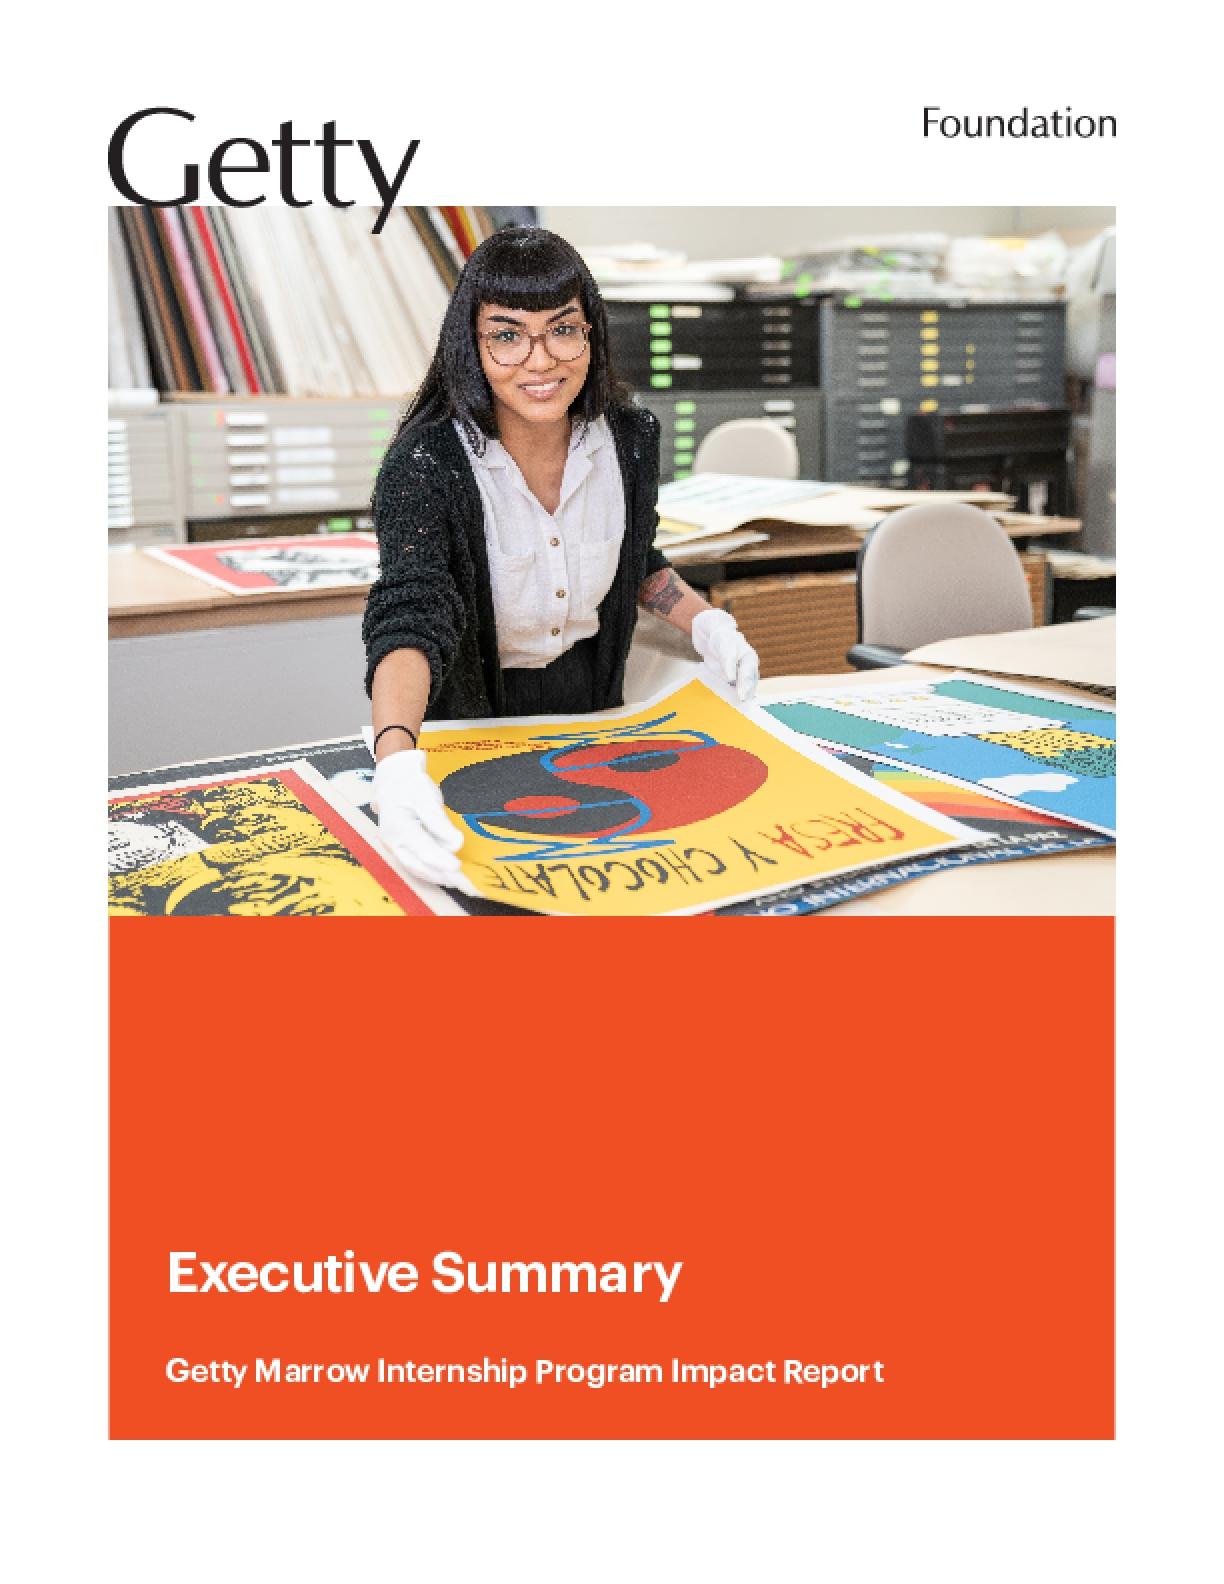 Executive Summary: Getty Marrow Internship Program Impact Report